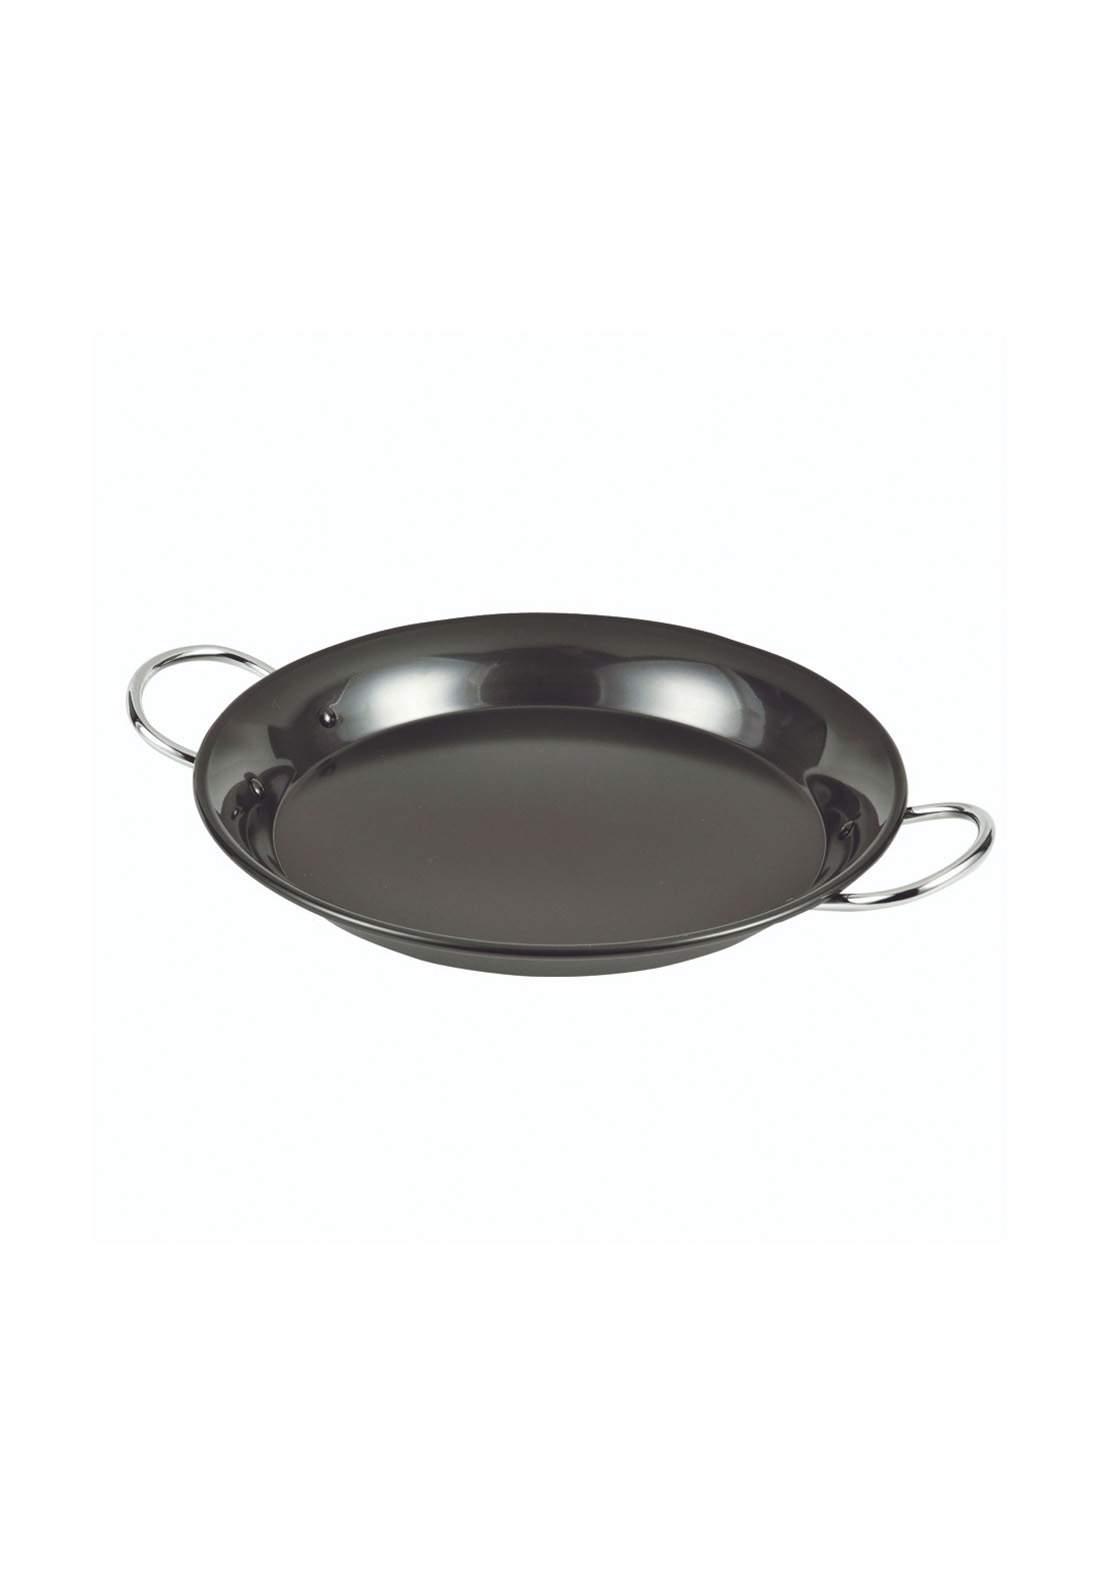 Pearl Metal HB-2650 La cooking iron round bread 27cm HB-2650-Black مقلاة دائرية الشكل